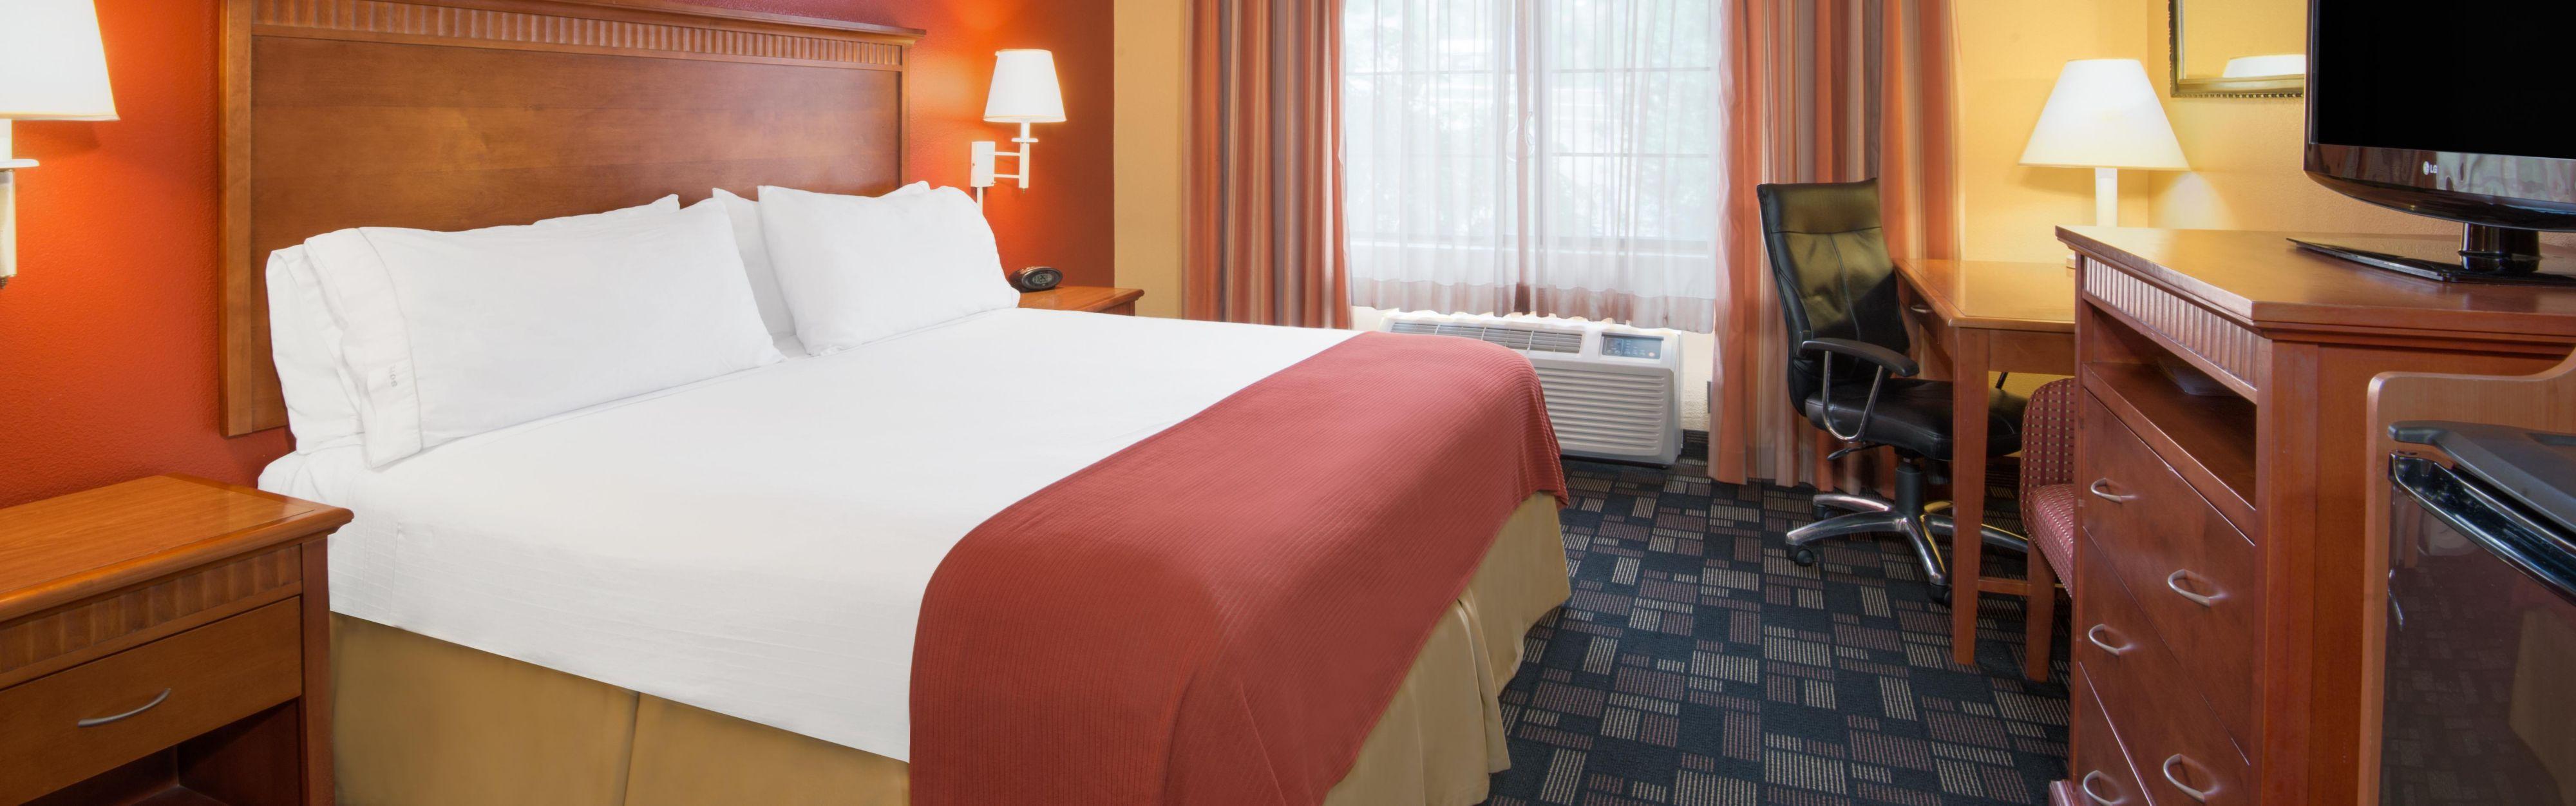 Holiday Inn Express Prescott image 1